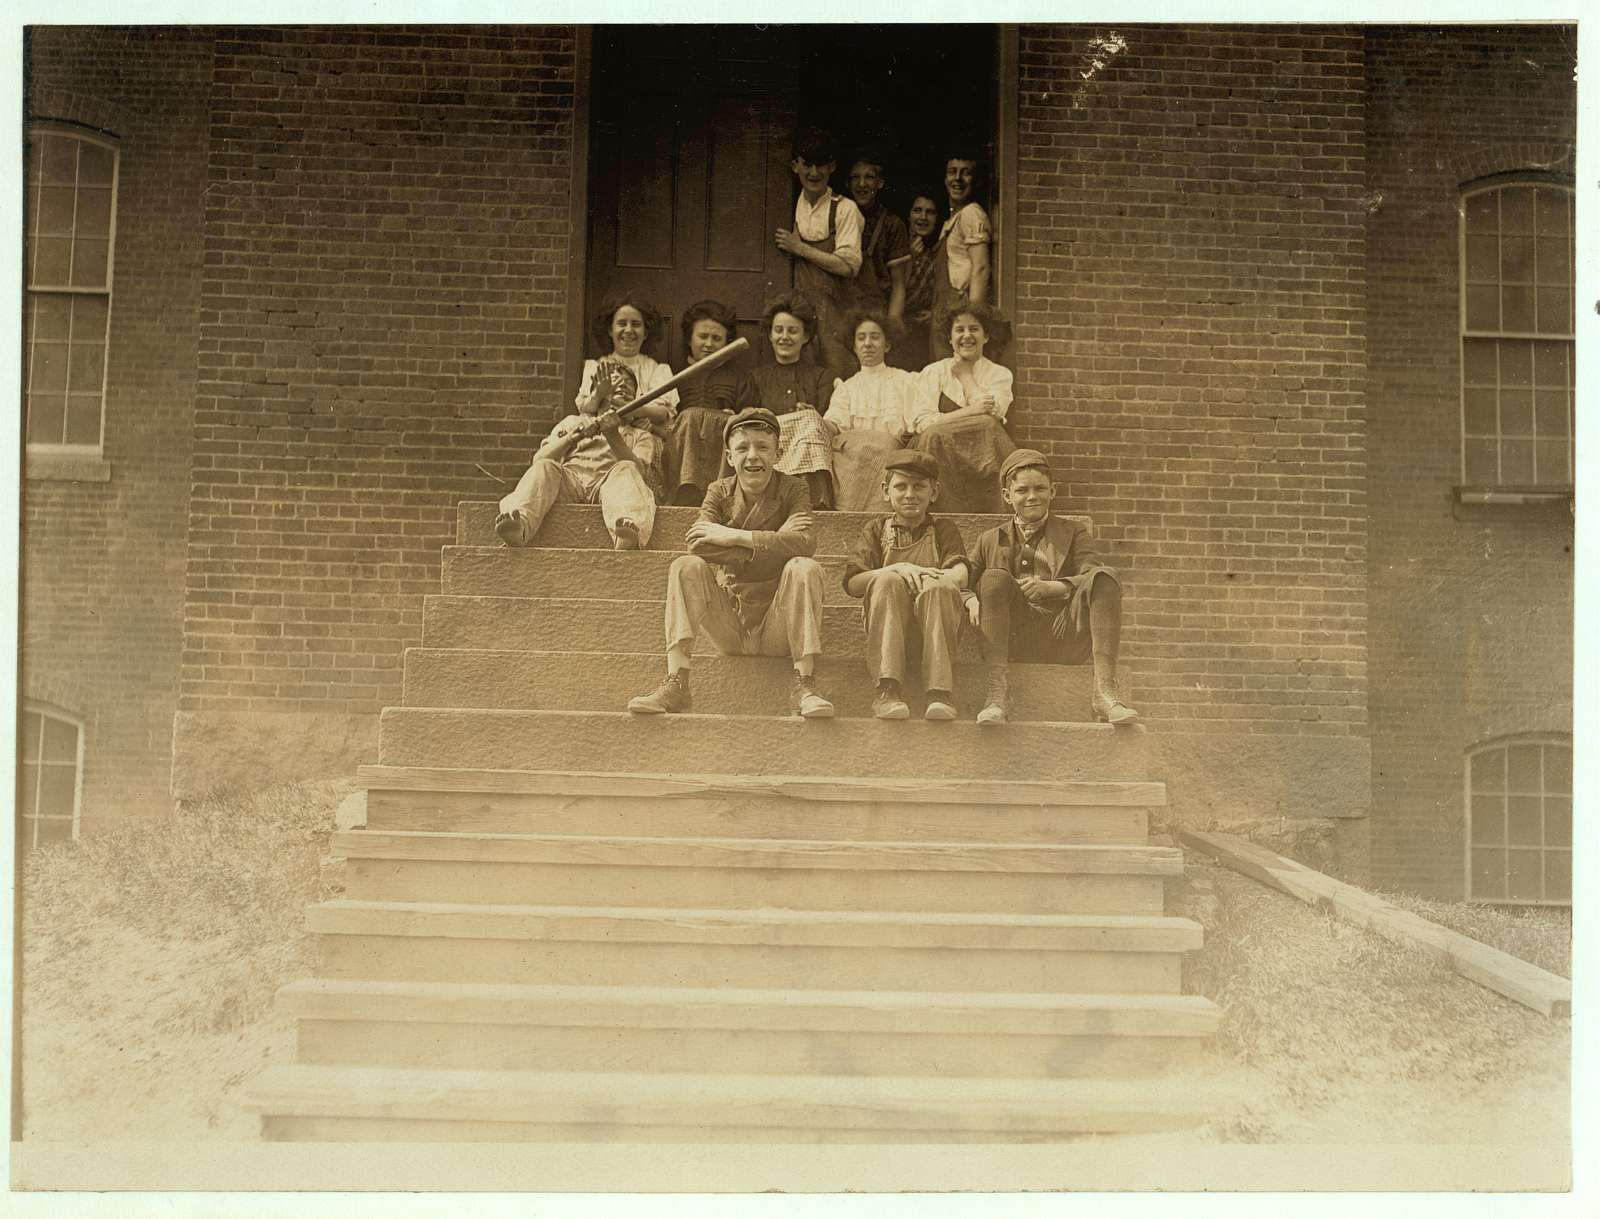 Noon hour. Group of workers in American Yarn Mfg. Co., Pawtucket, R.I. Location: Pawtucket, Rhode Island